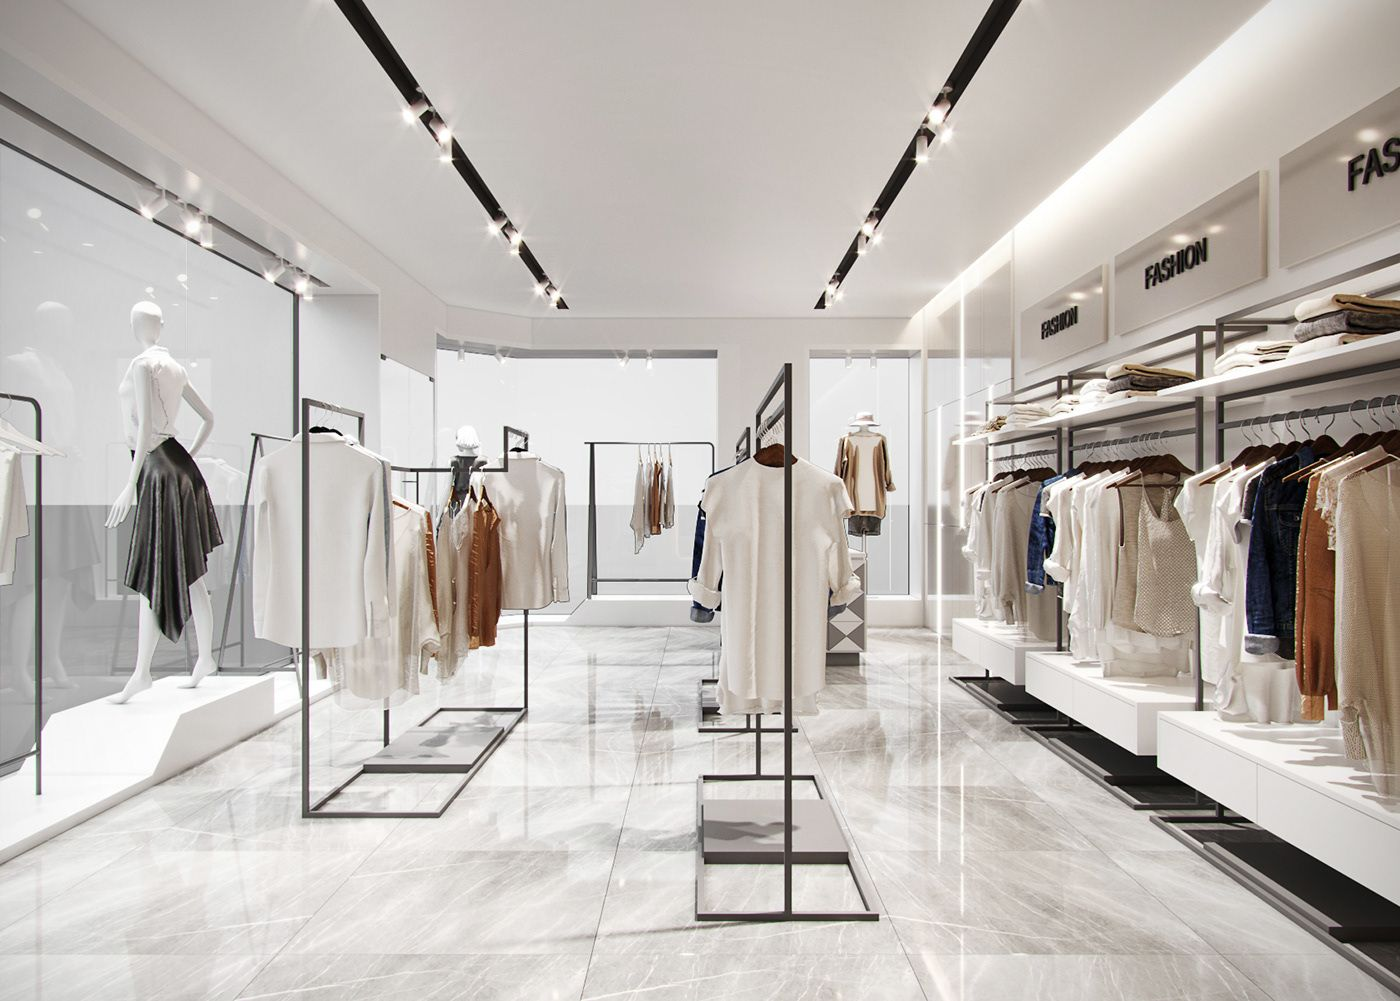 Shop Fashion on Behance | Fashion shop interior, Store design interior,  Store design boutique